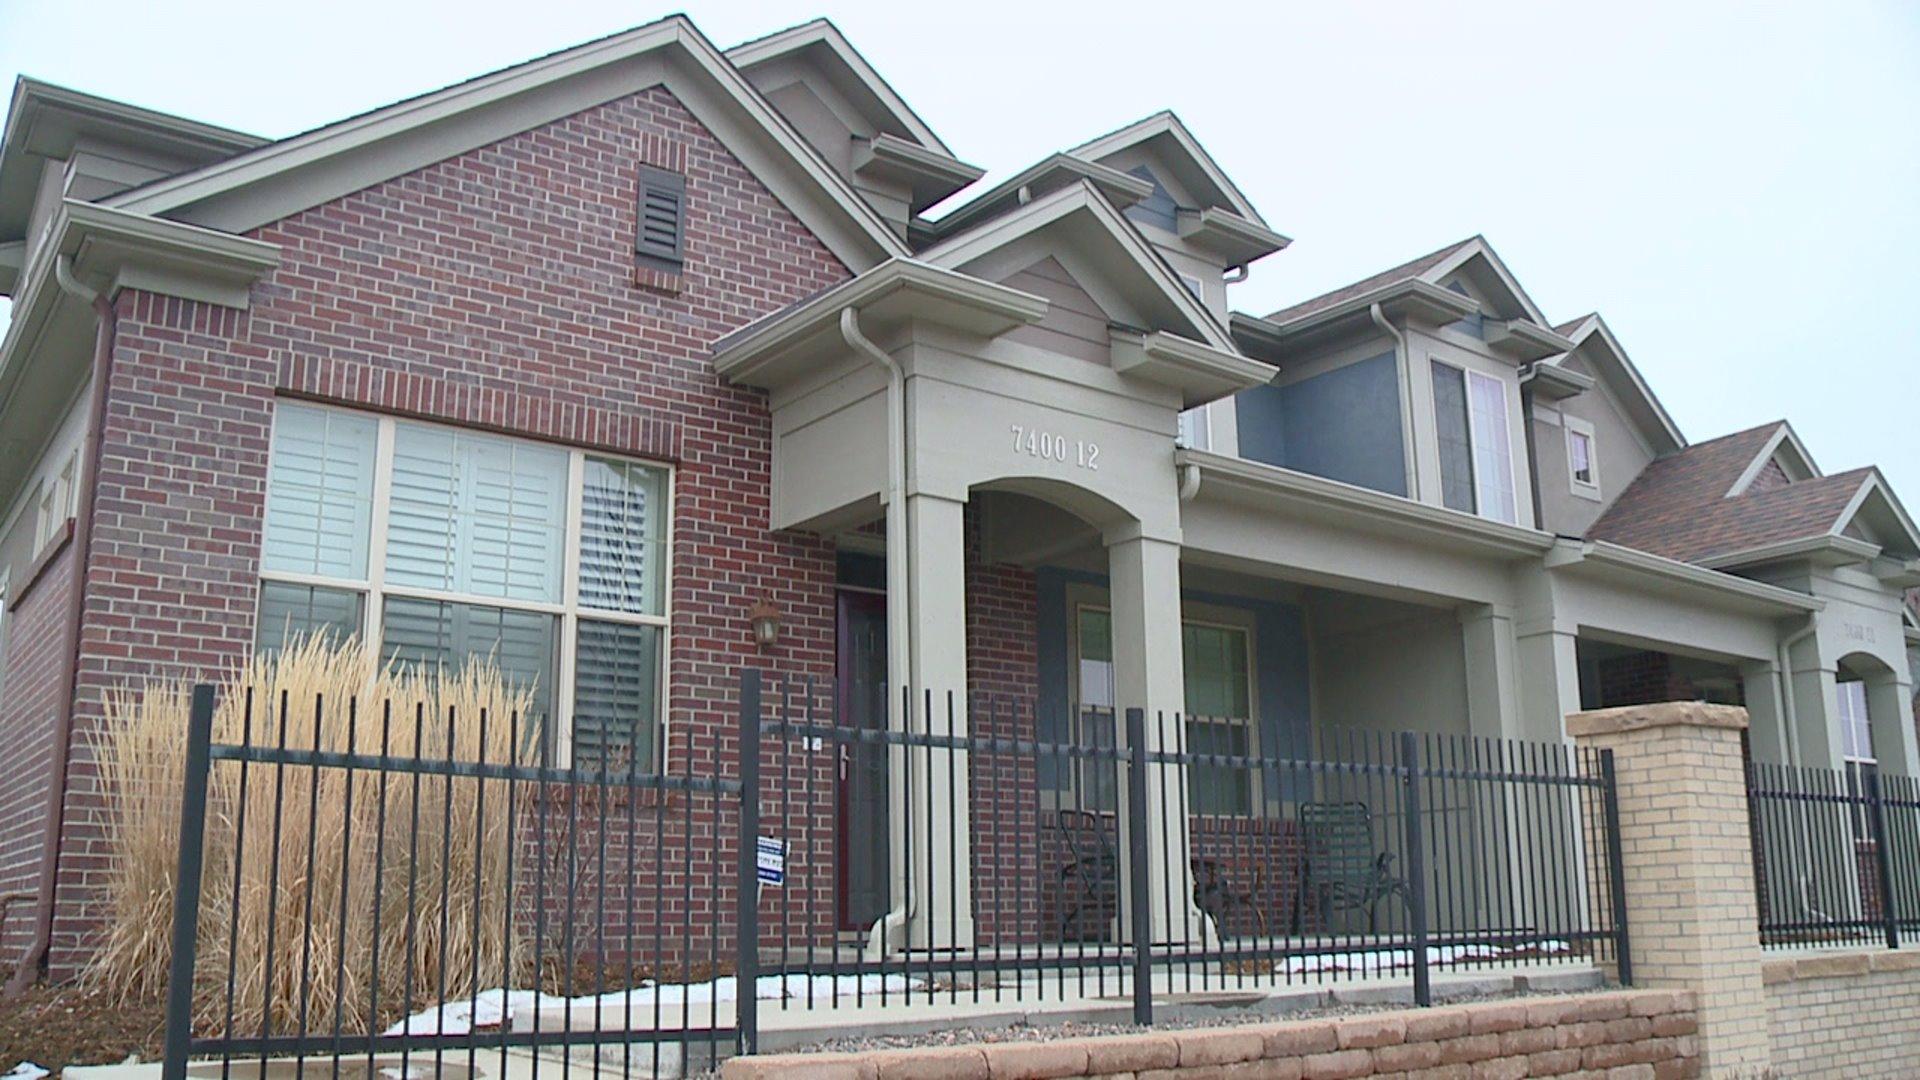 Condominium in Denver's Lowry neighborhood